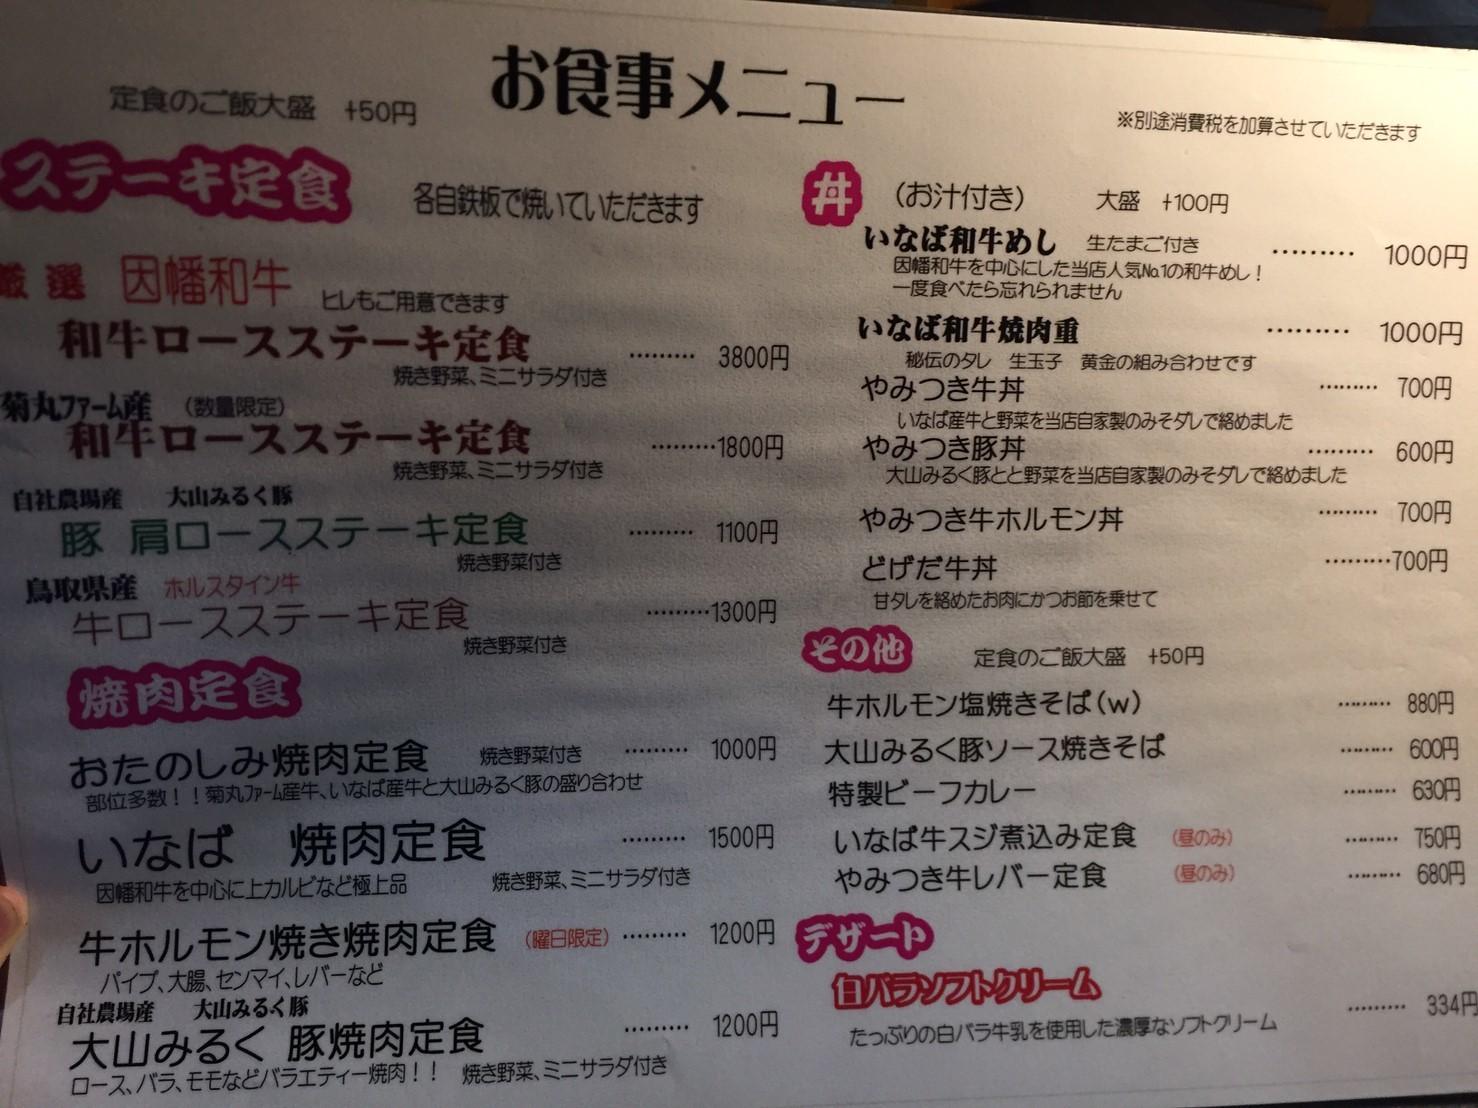 焼肉 鳥取牧場村 厚切りタン・山葵塩_e0115904_08025910.jpg